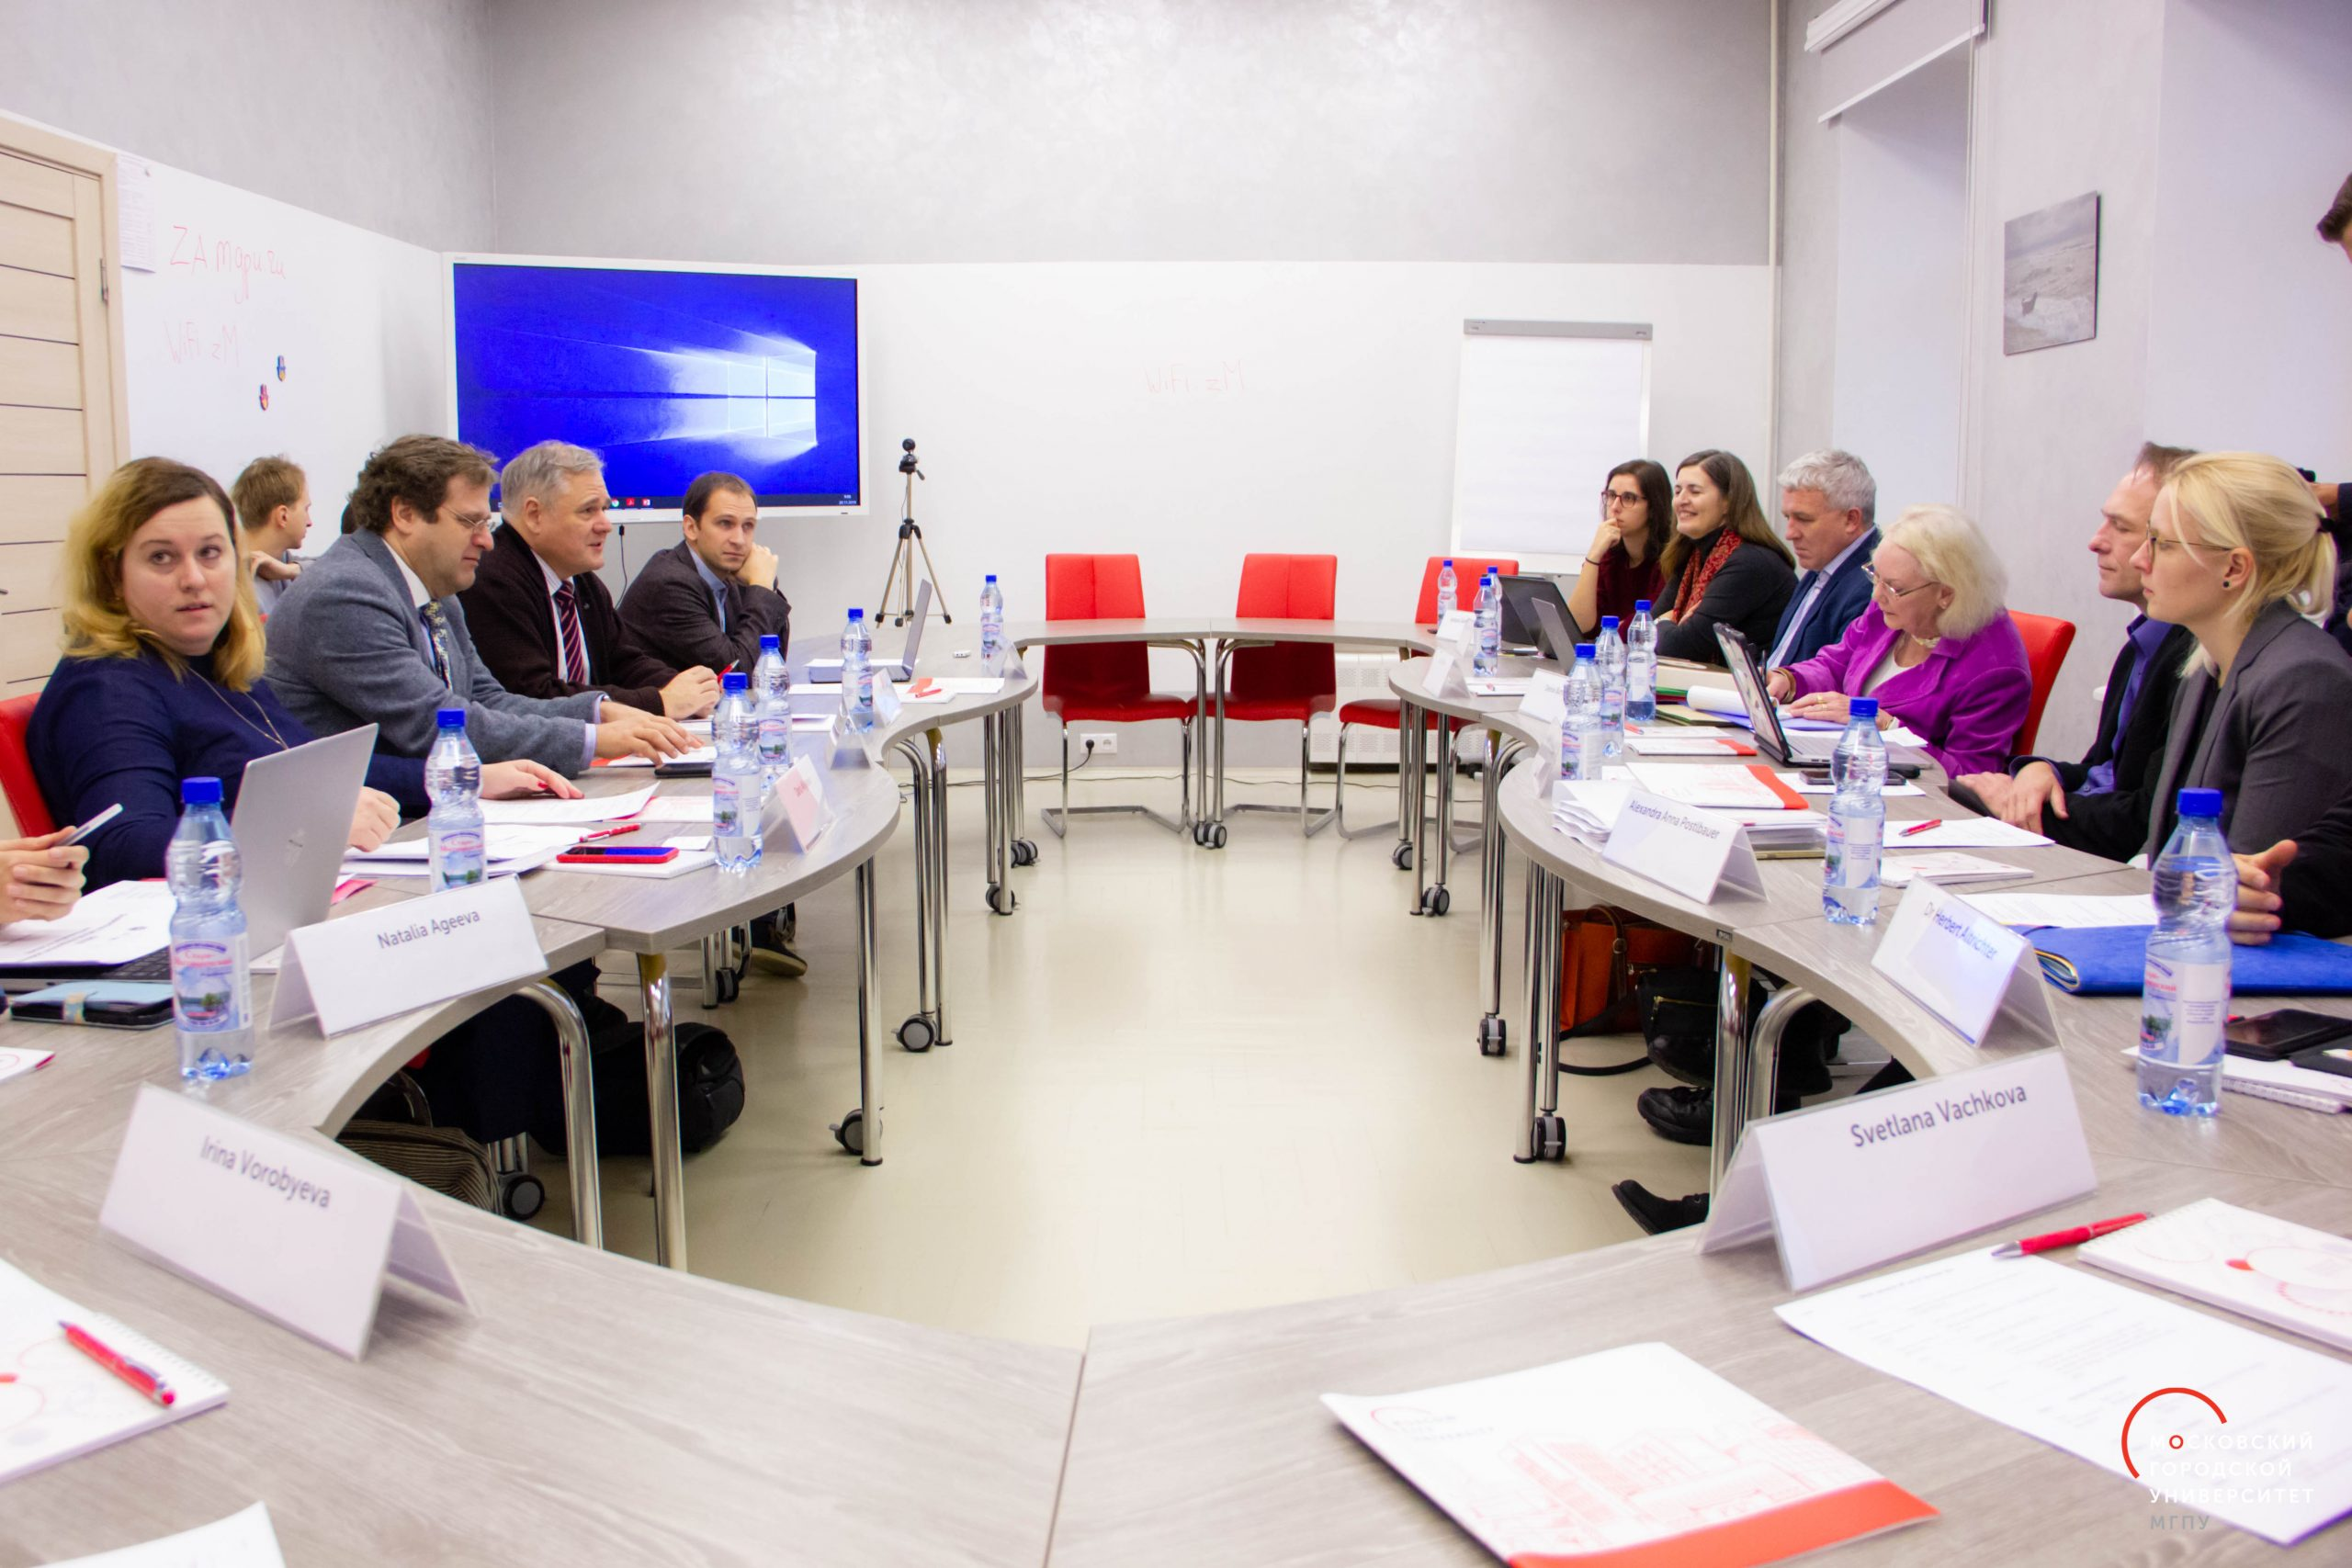 The kick-off meeting of the Erasmus+ International Consortium at MCU